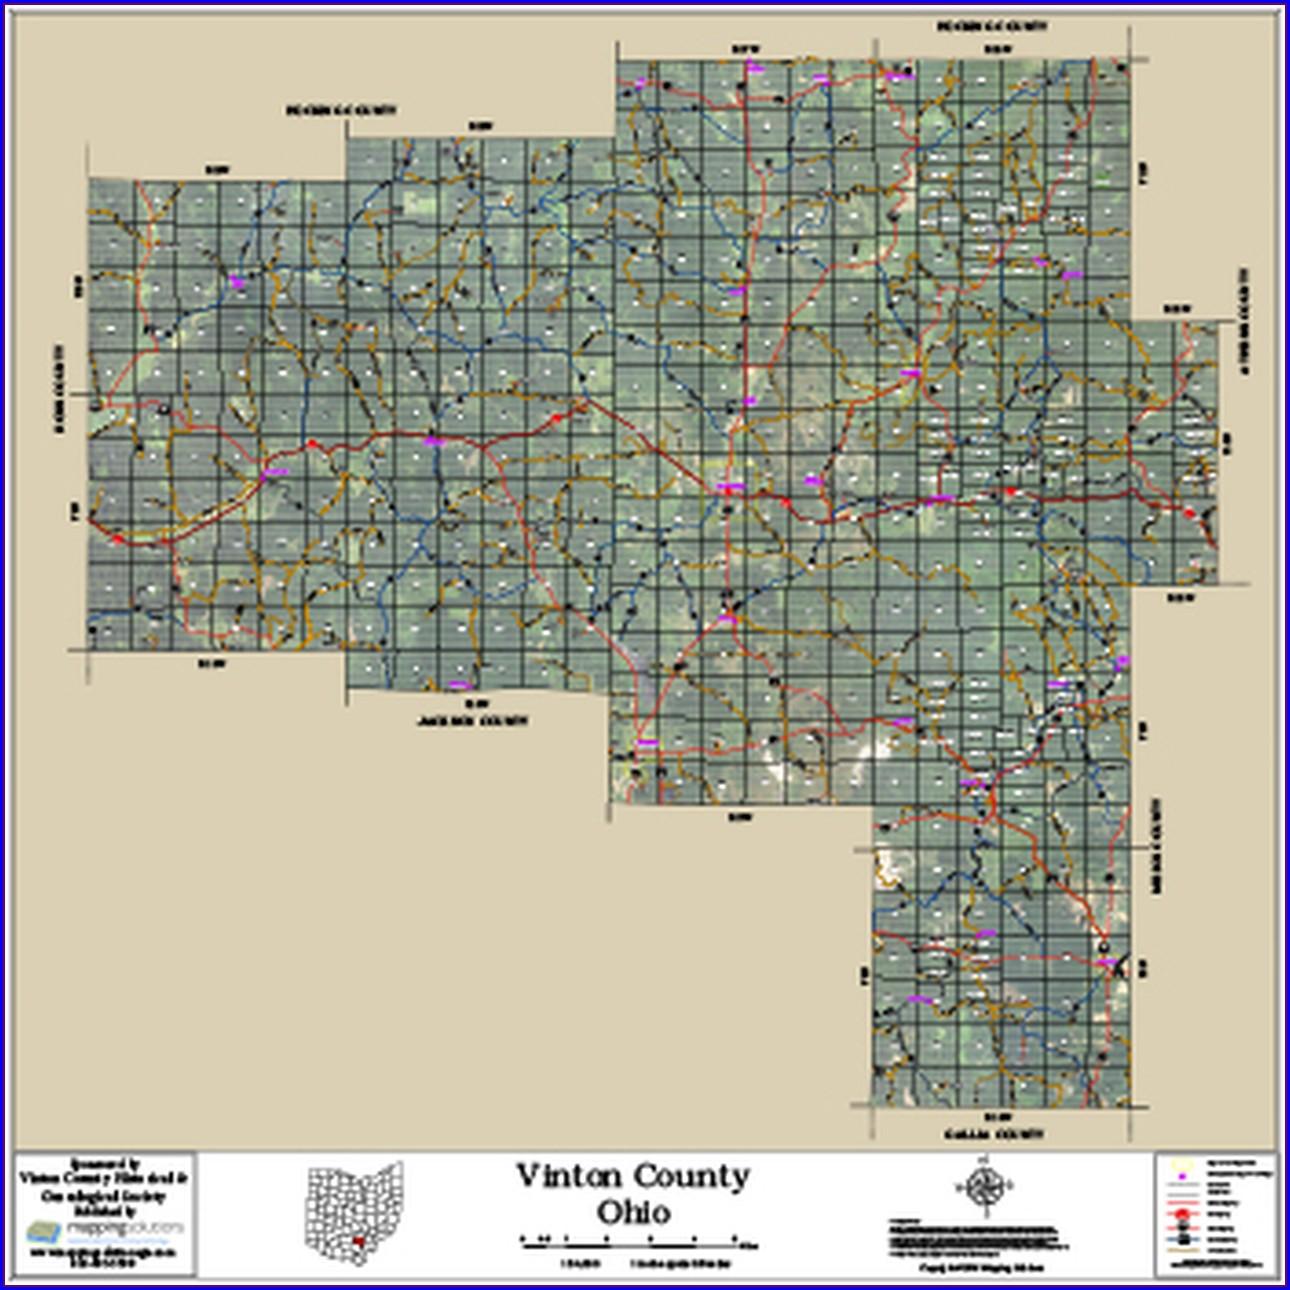 Vinton County Ohio Parcel Map